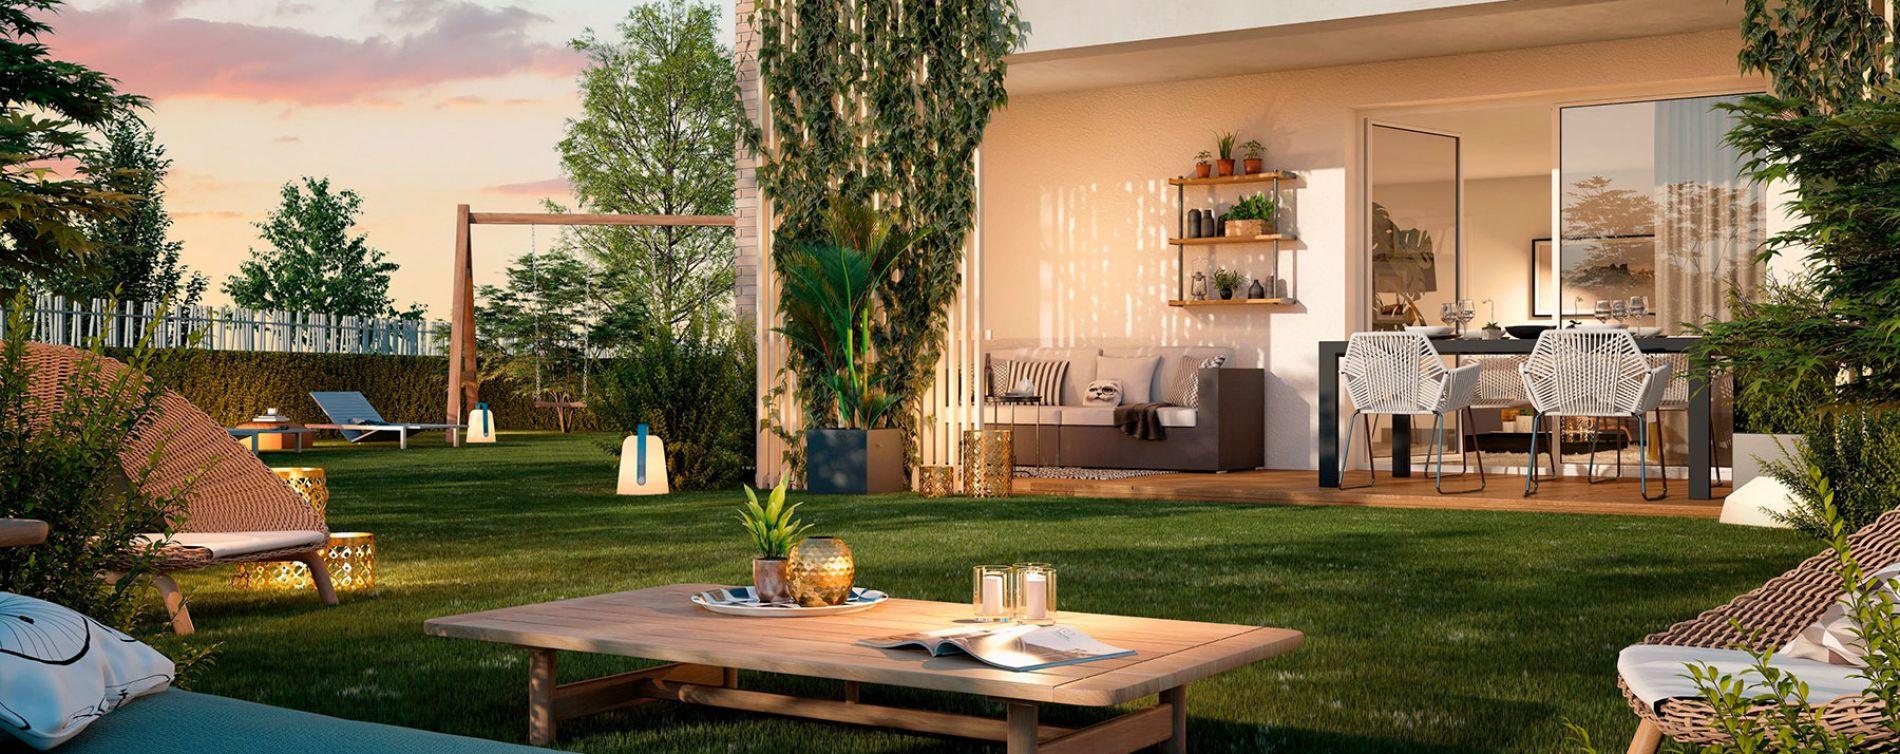 Toulouse : programme immobilier neuve « Le Val'Oriane » (2)